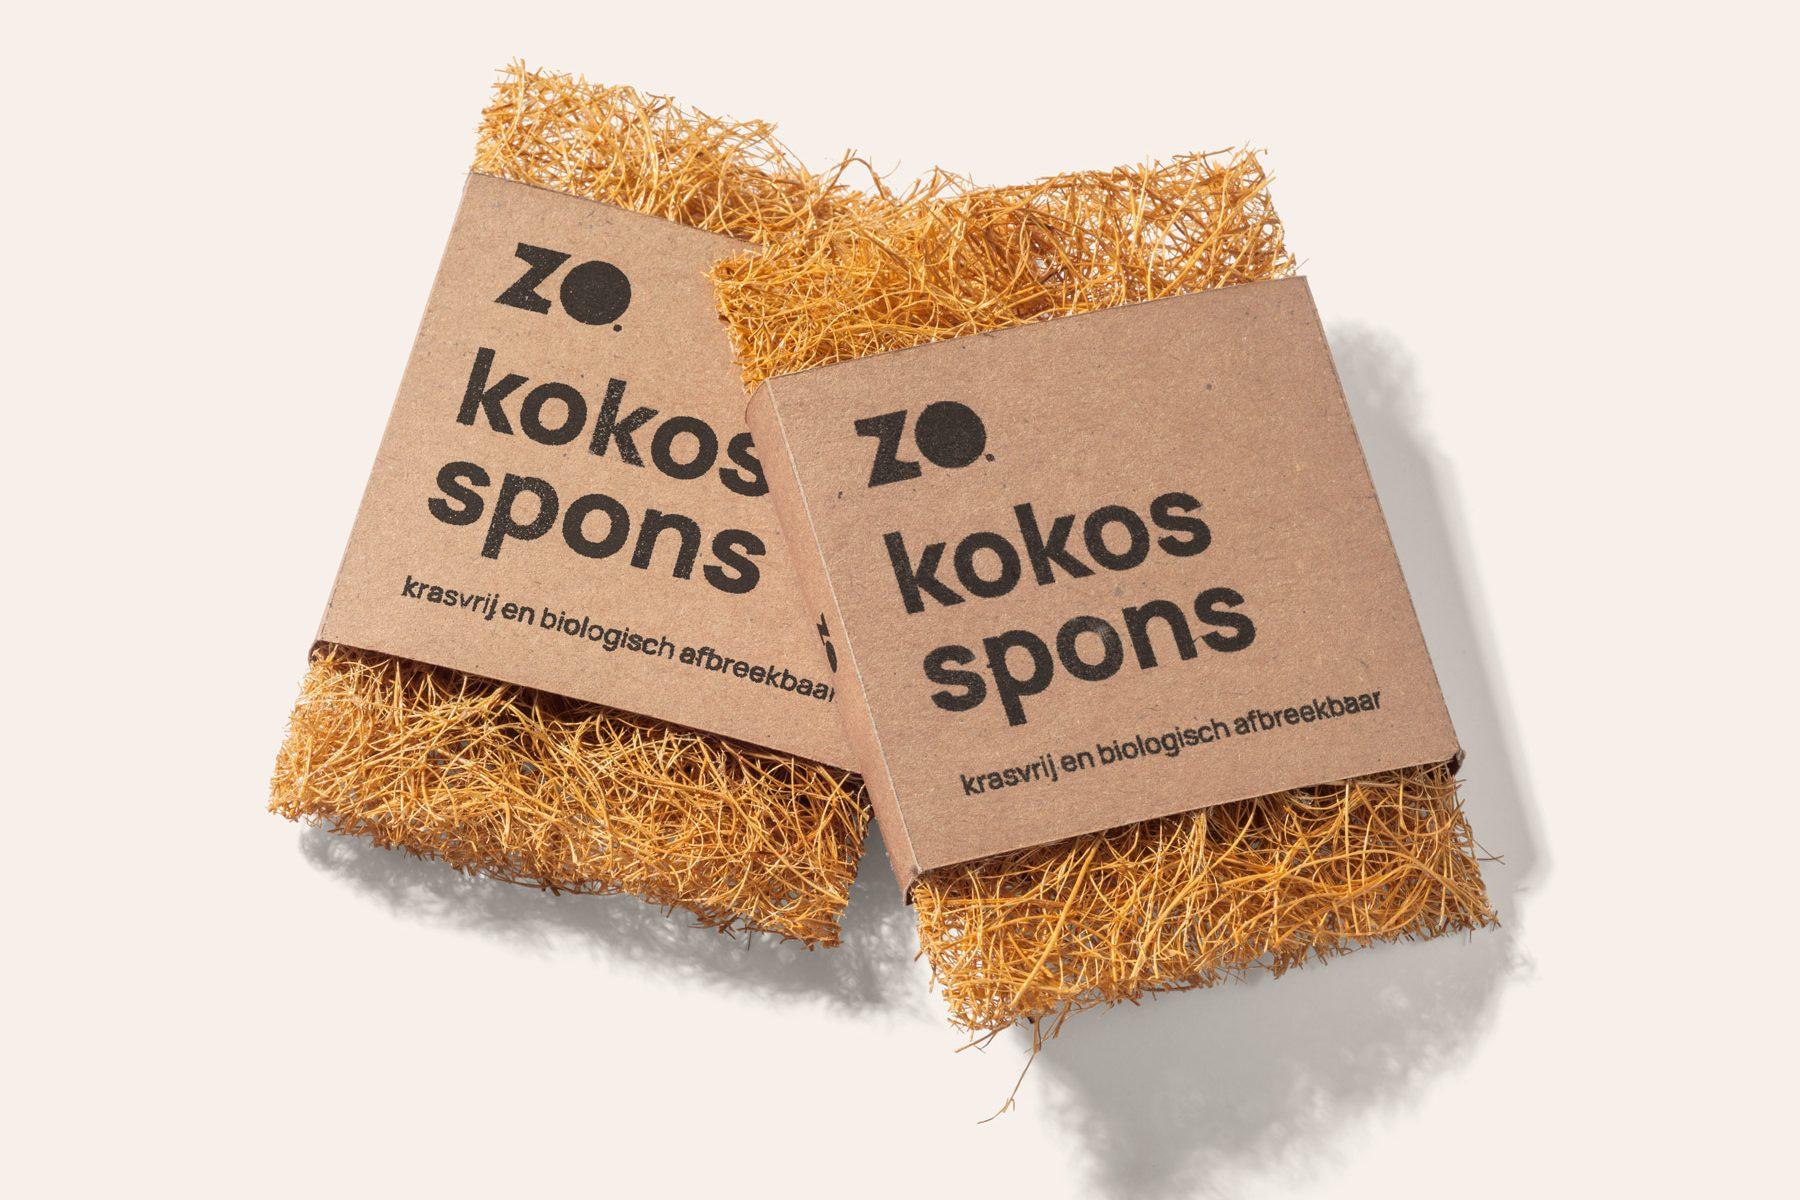 zo_kokosspons